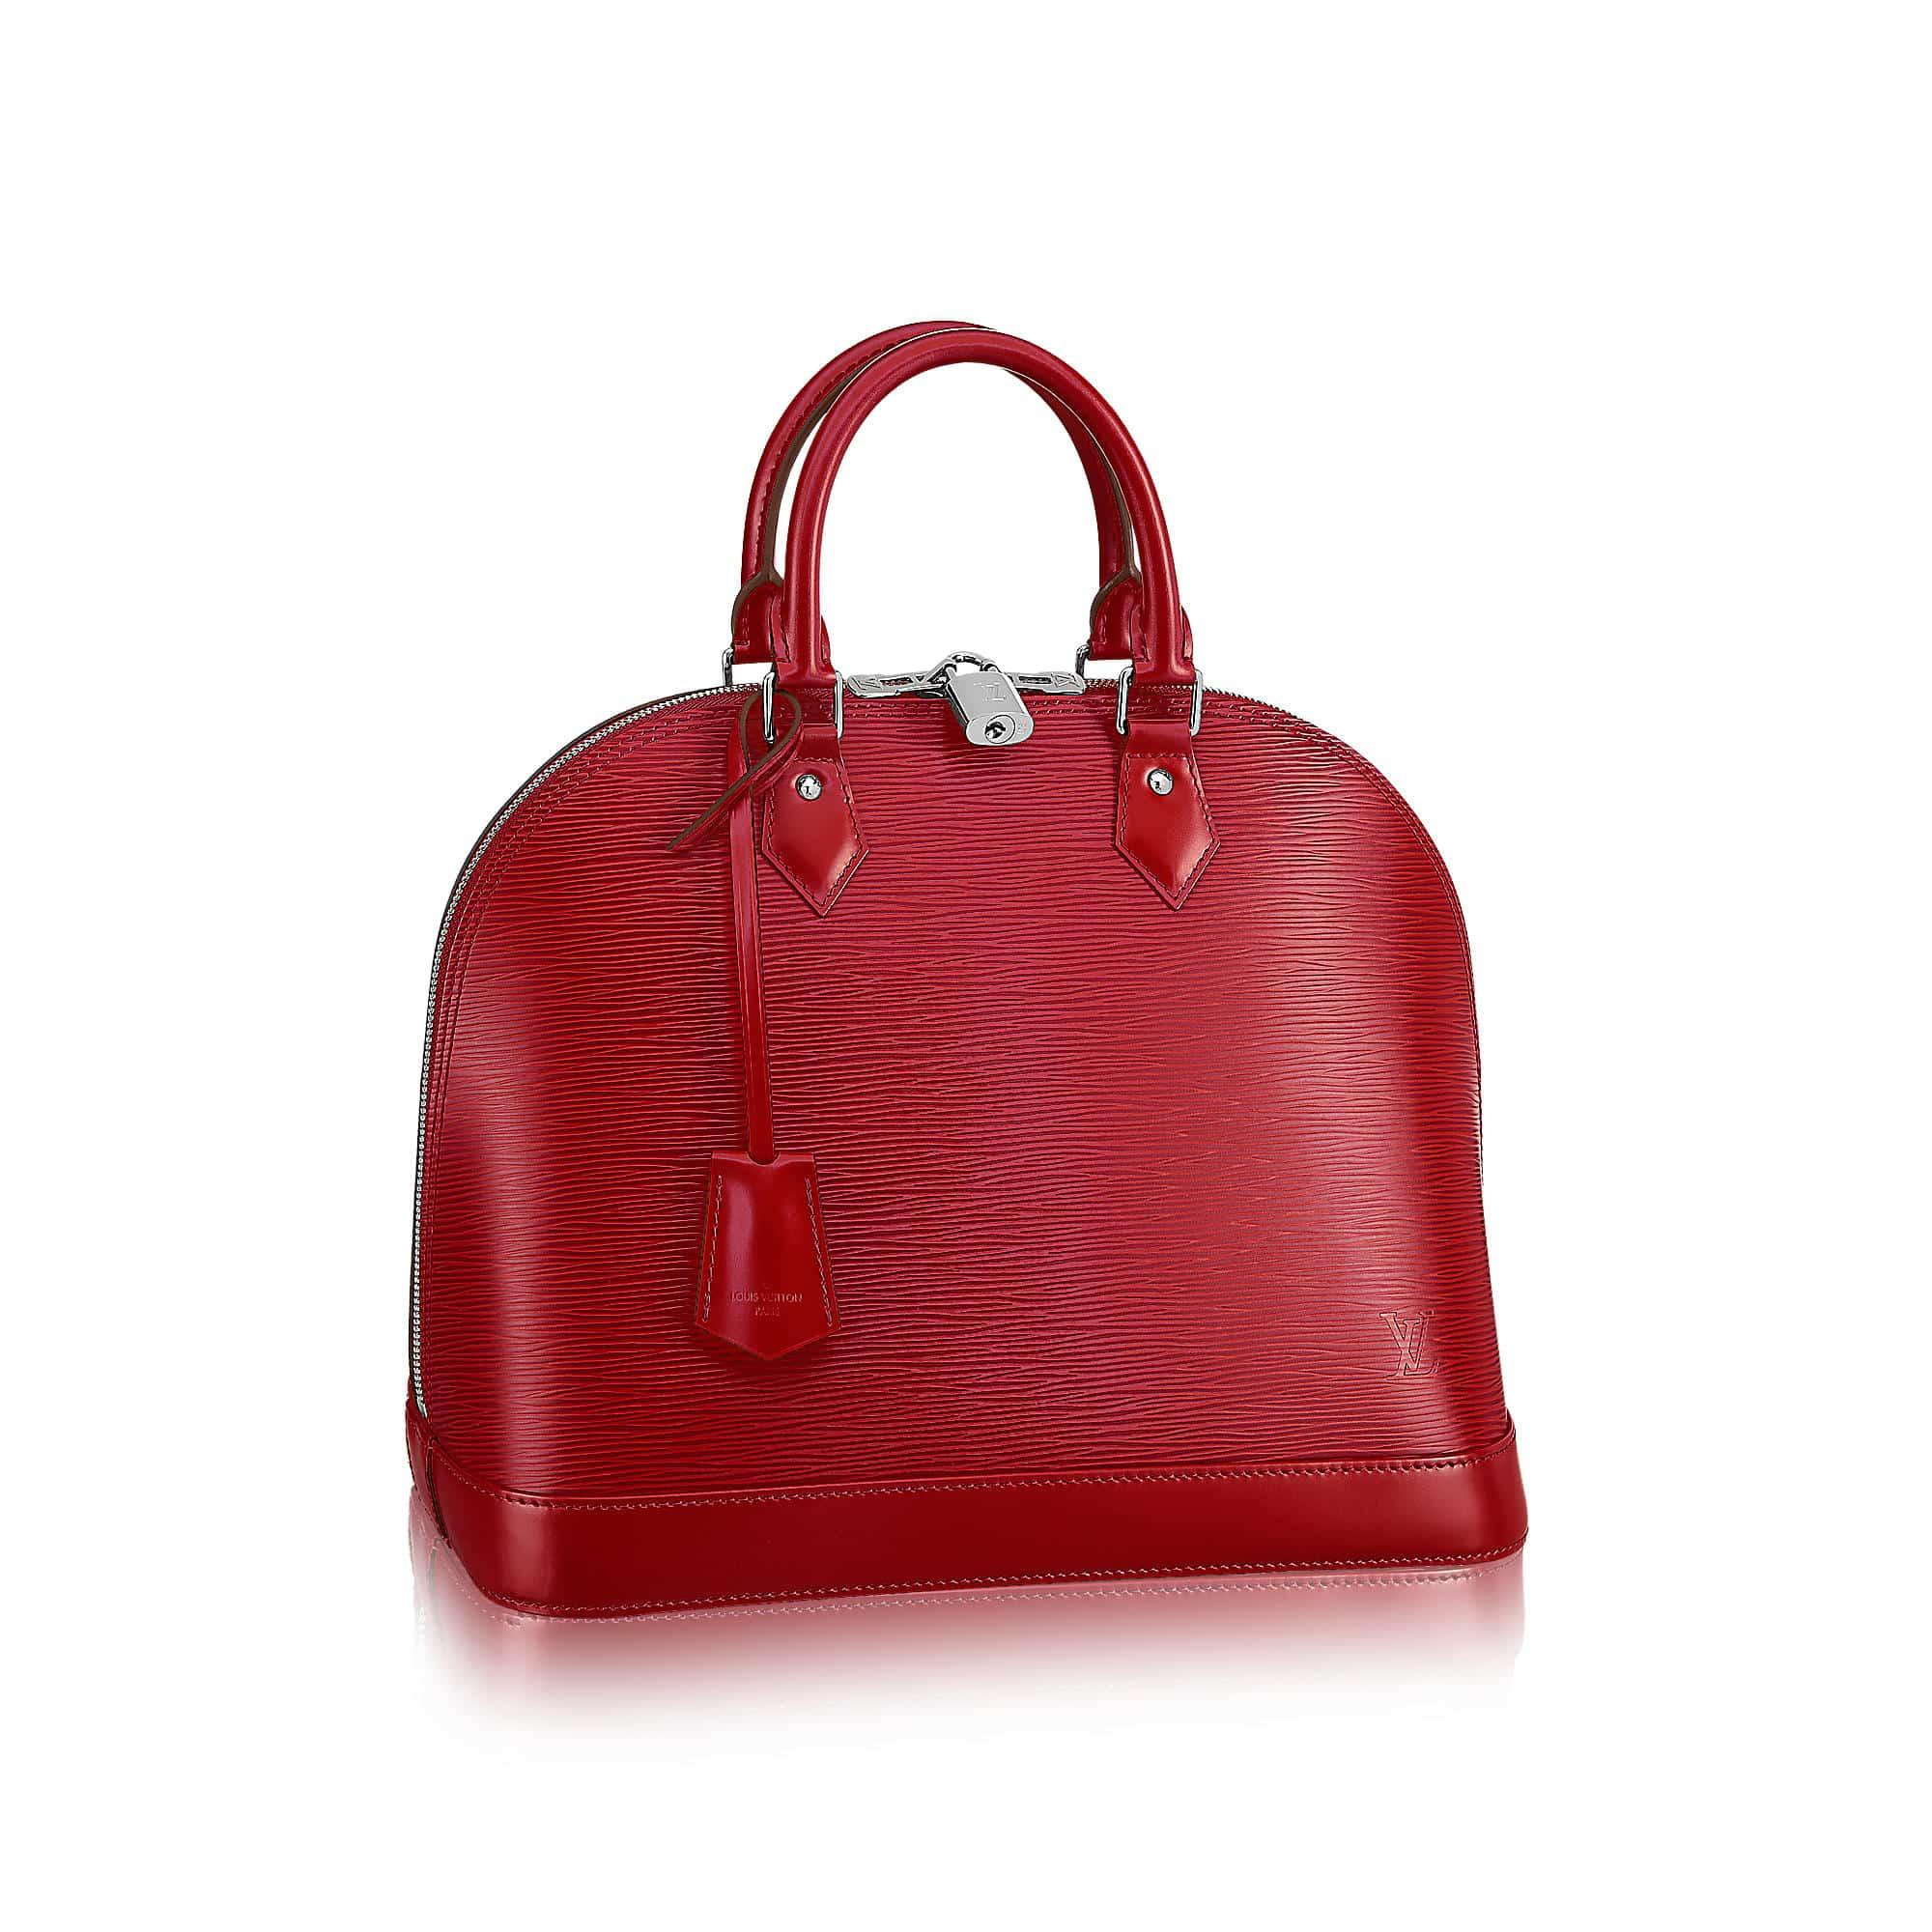 Alma mm epi leather rossa